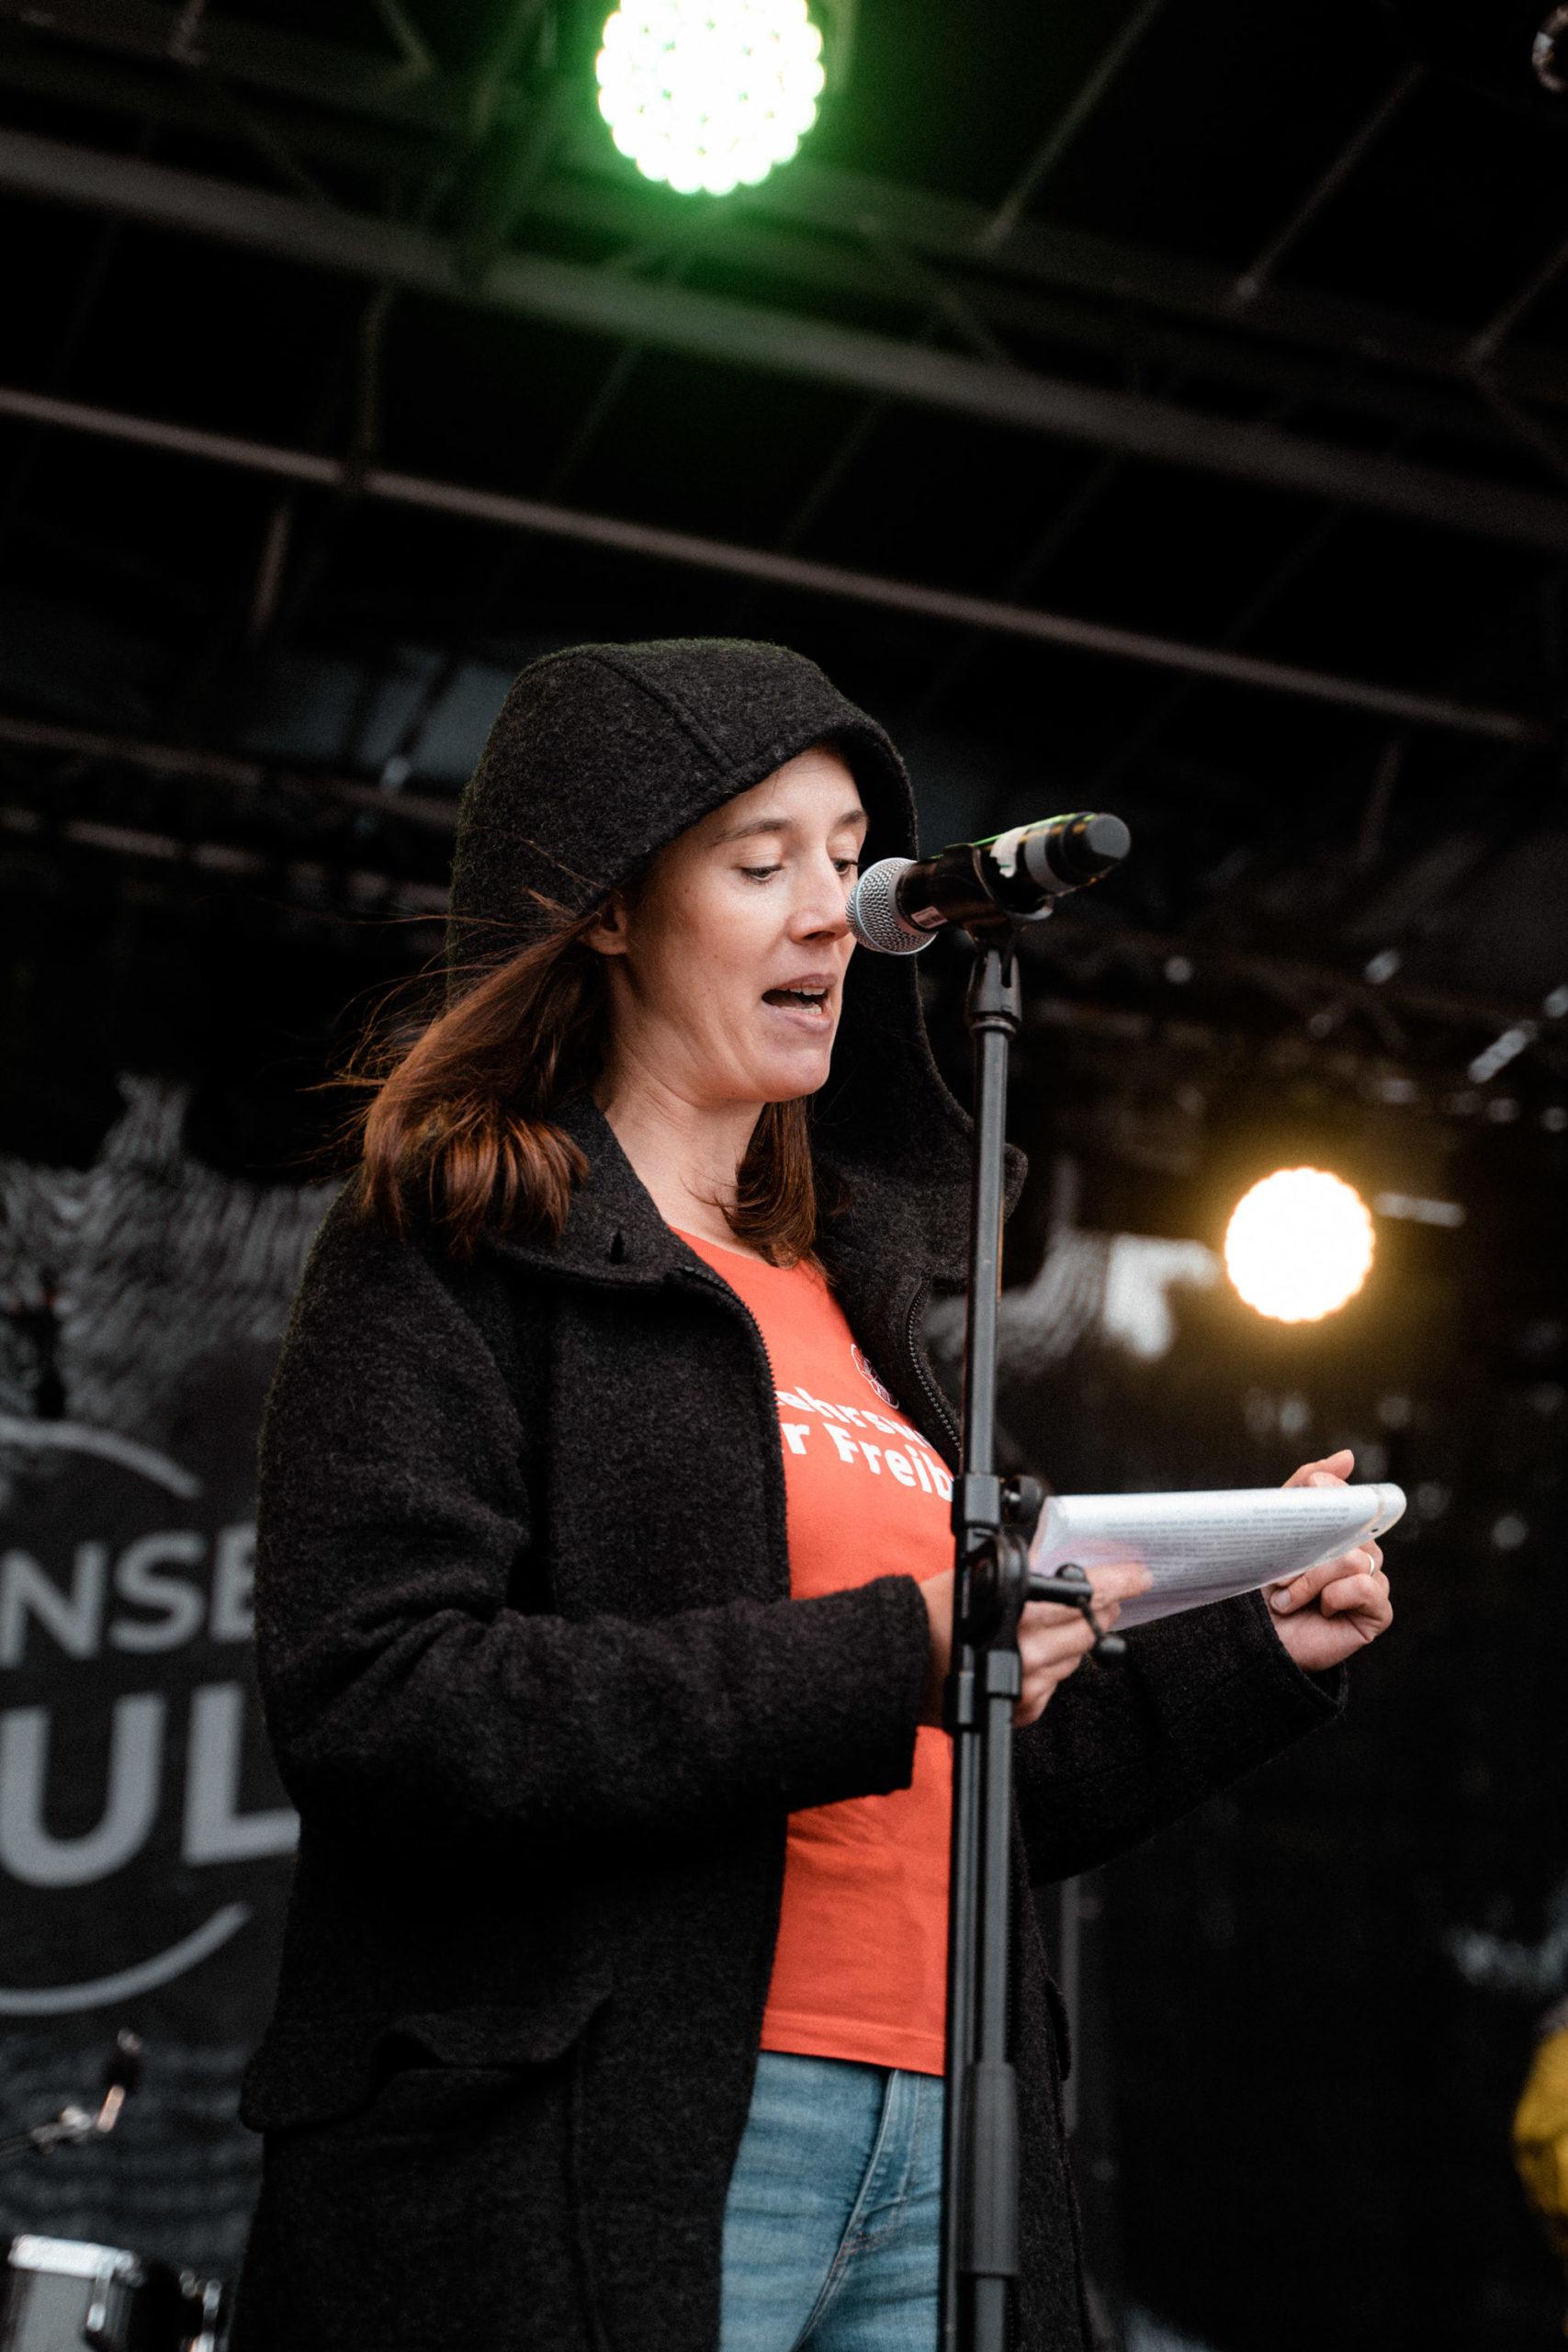 Ingrid Marienthal, FR-Entscheid